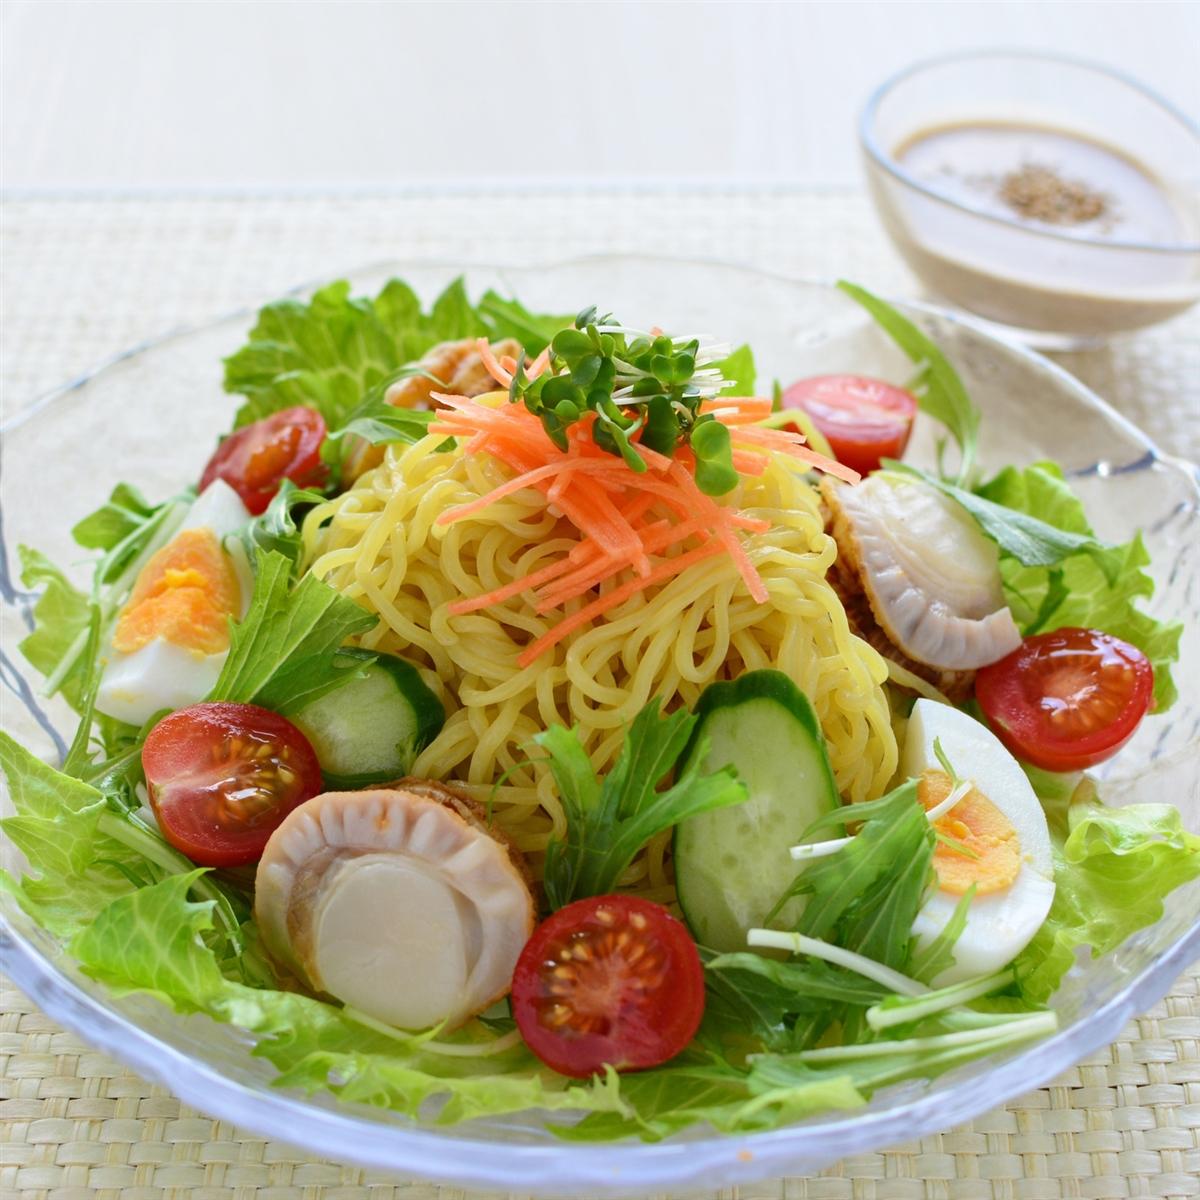 Shirataki Ramen Style Noodles Starter Pack Gluten Free Ramen Healthy Substitute For Noodles